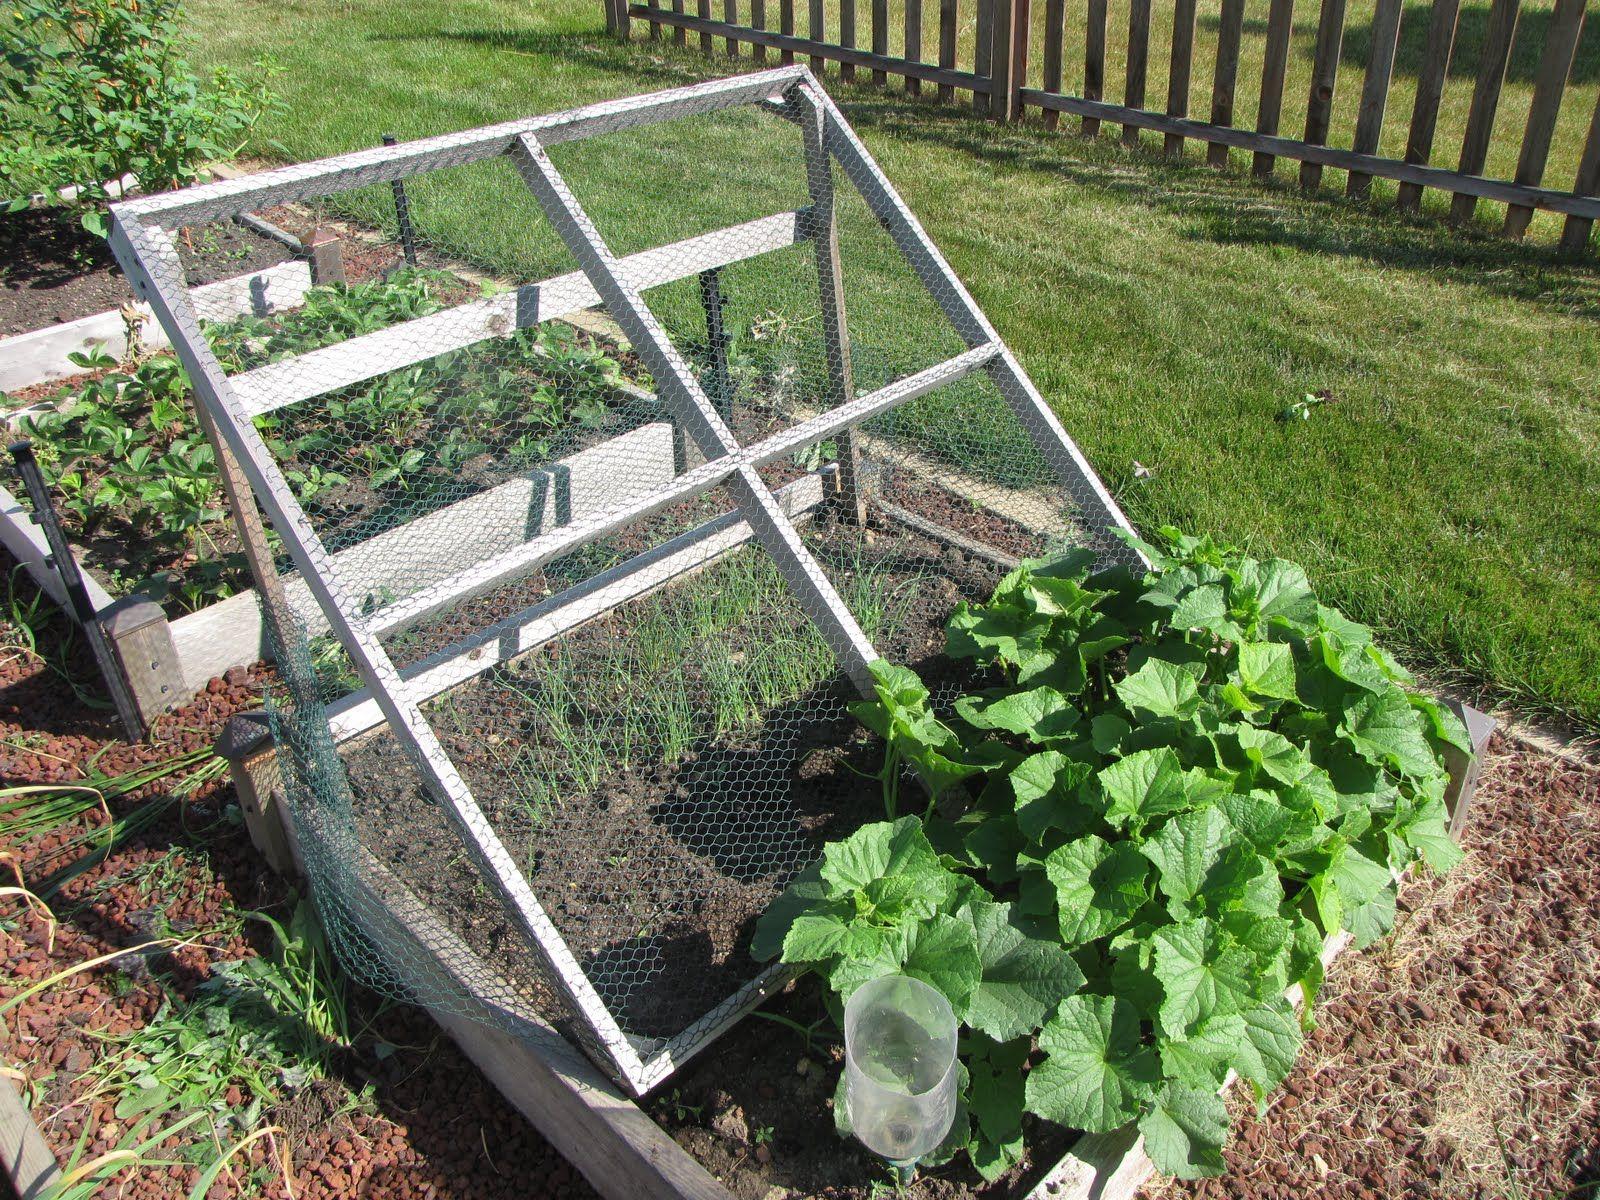 Marvelous Cucumber Trellis Ideas Part - 3: Raised Bed Cucumber Trellis Ideas